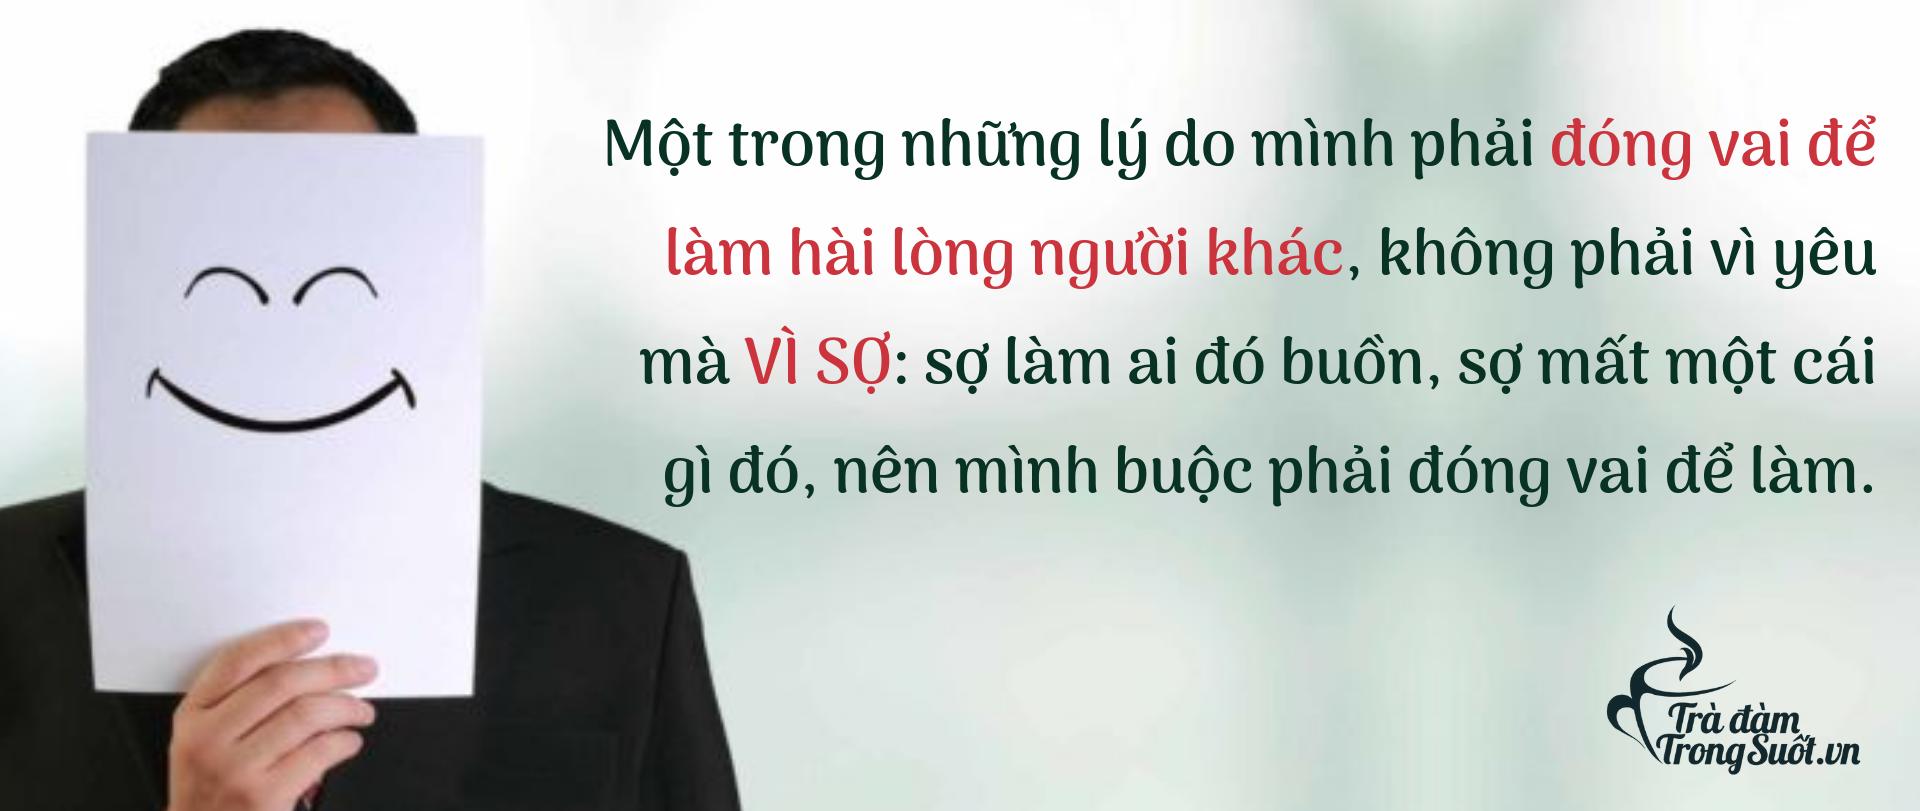 https://trongsuot.com/wp-content/uploads/2019/07/Q3_Mot-trong-nhung-ly-do.png